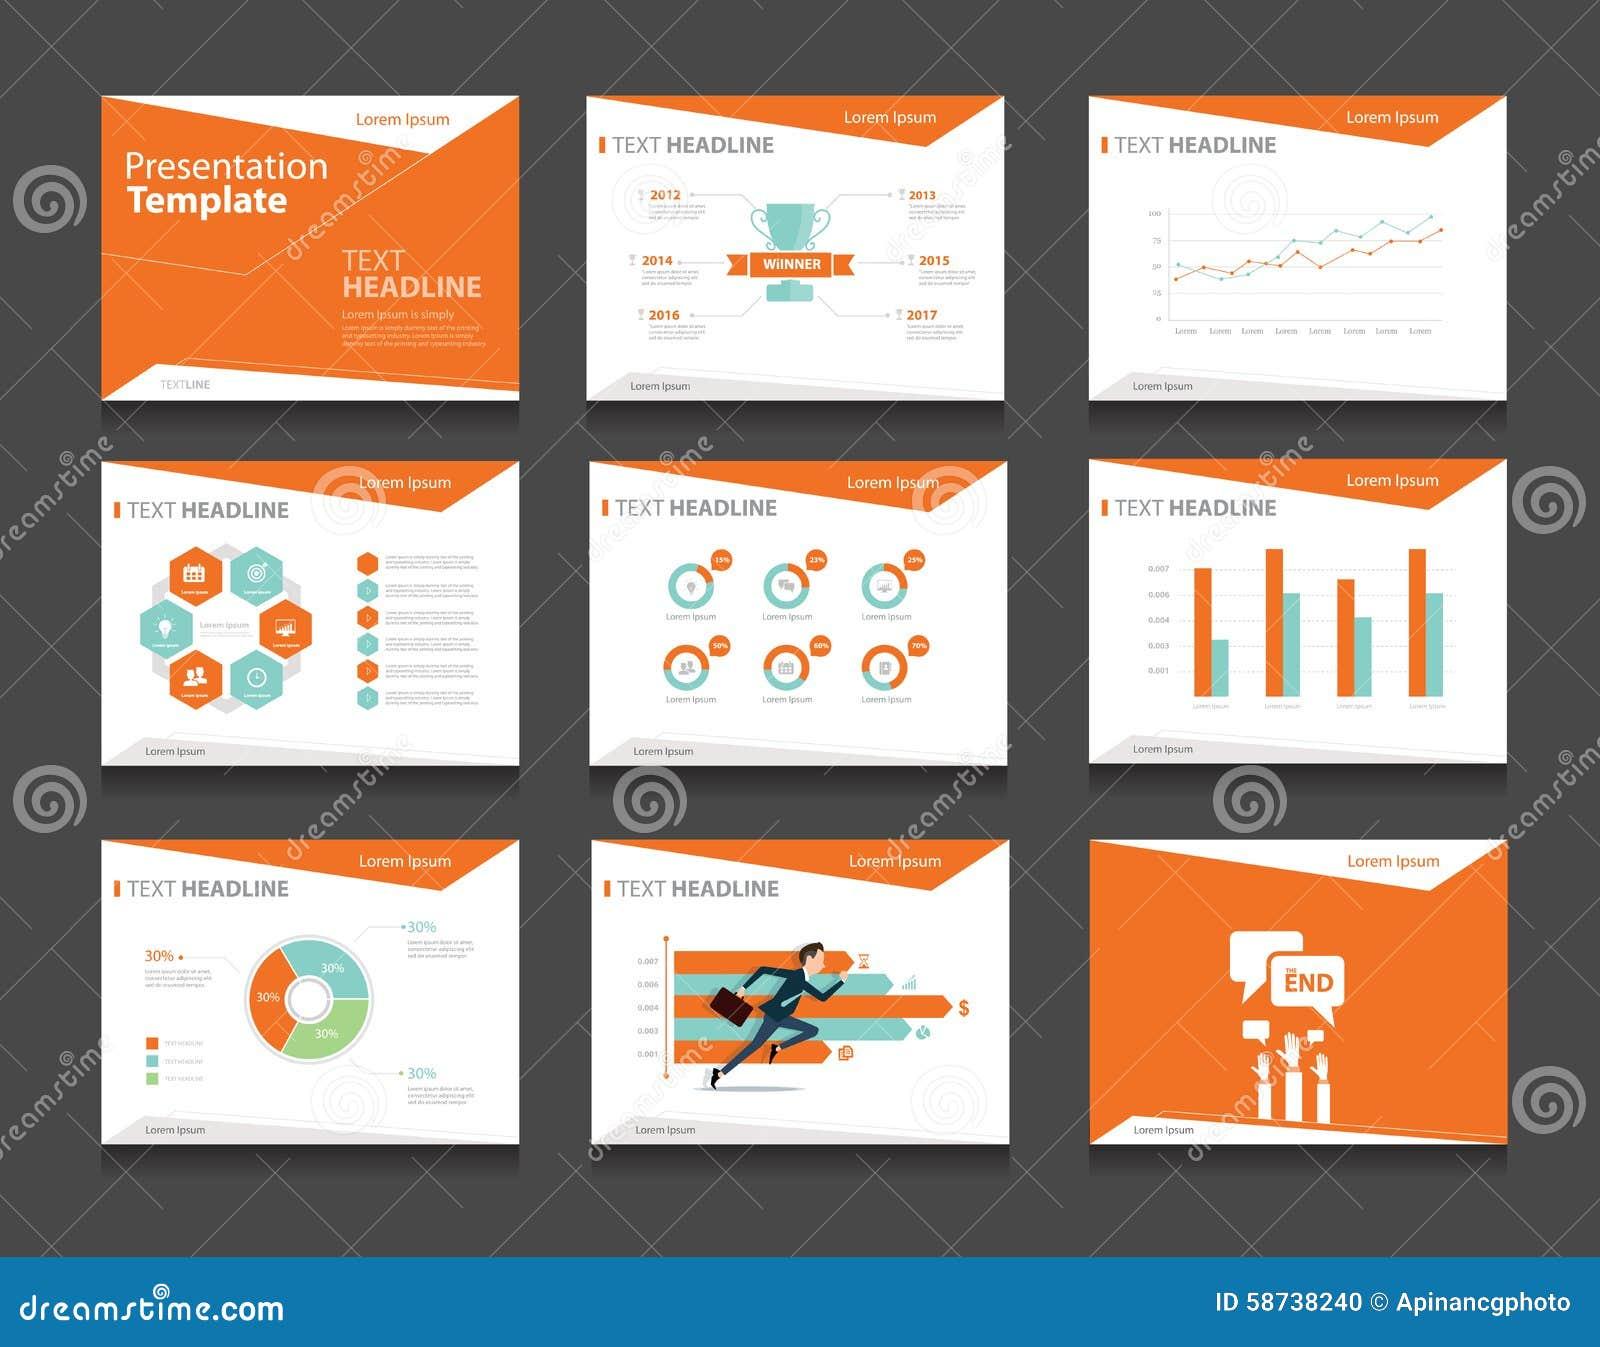 Powerpoint presentation geminifm powerpoint presentation toneelgroepblik Image collections